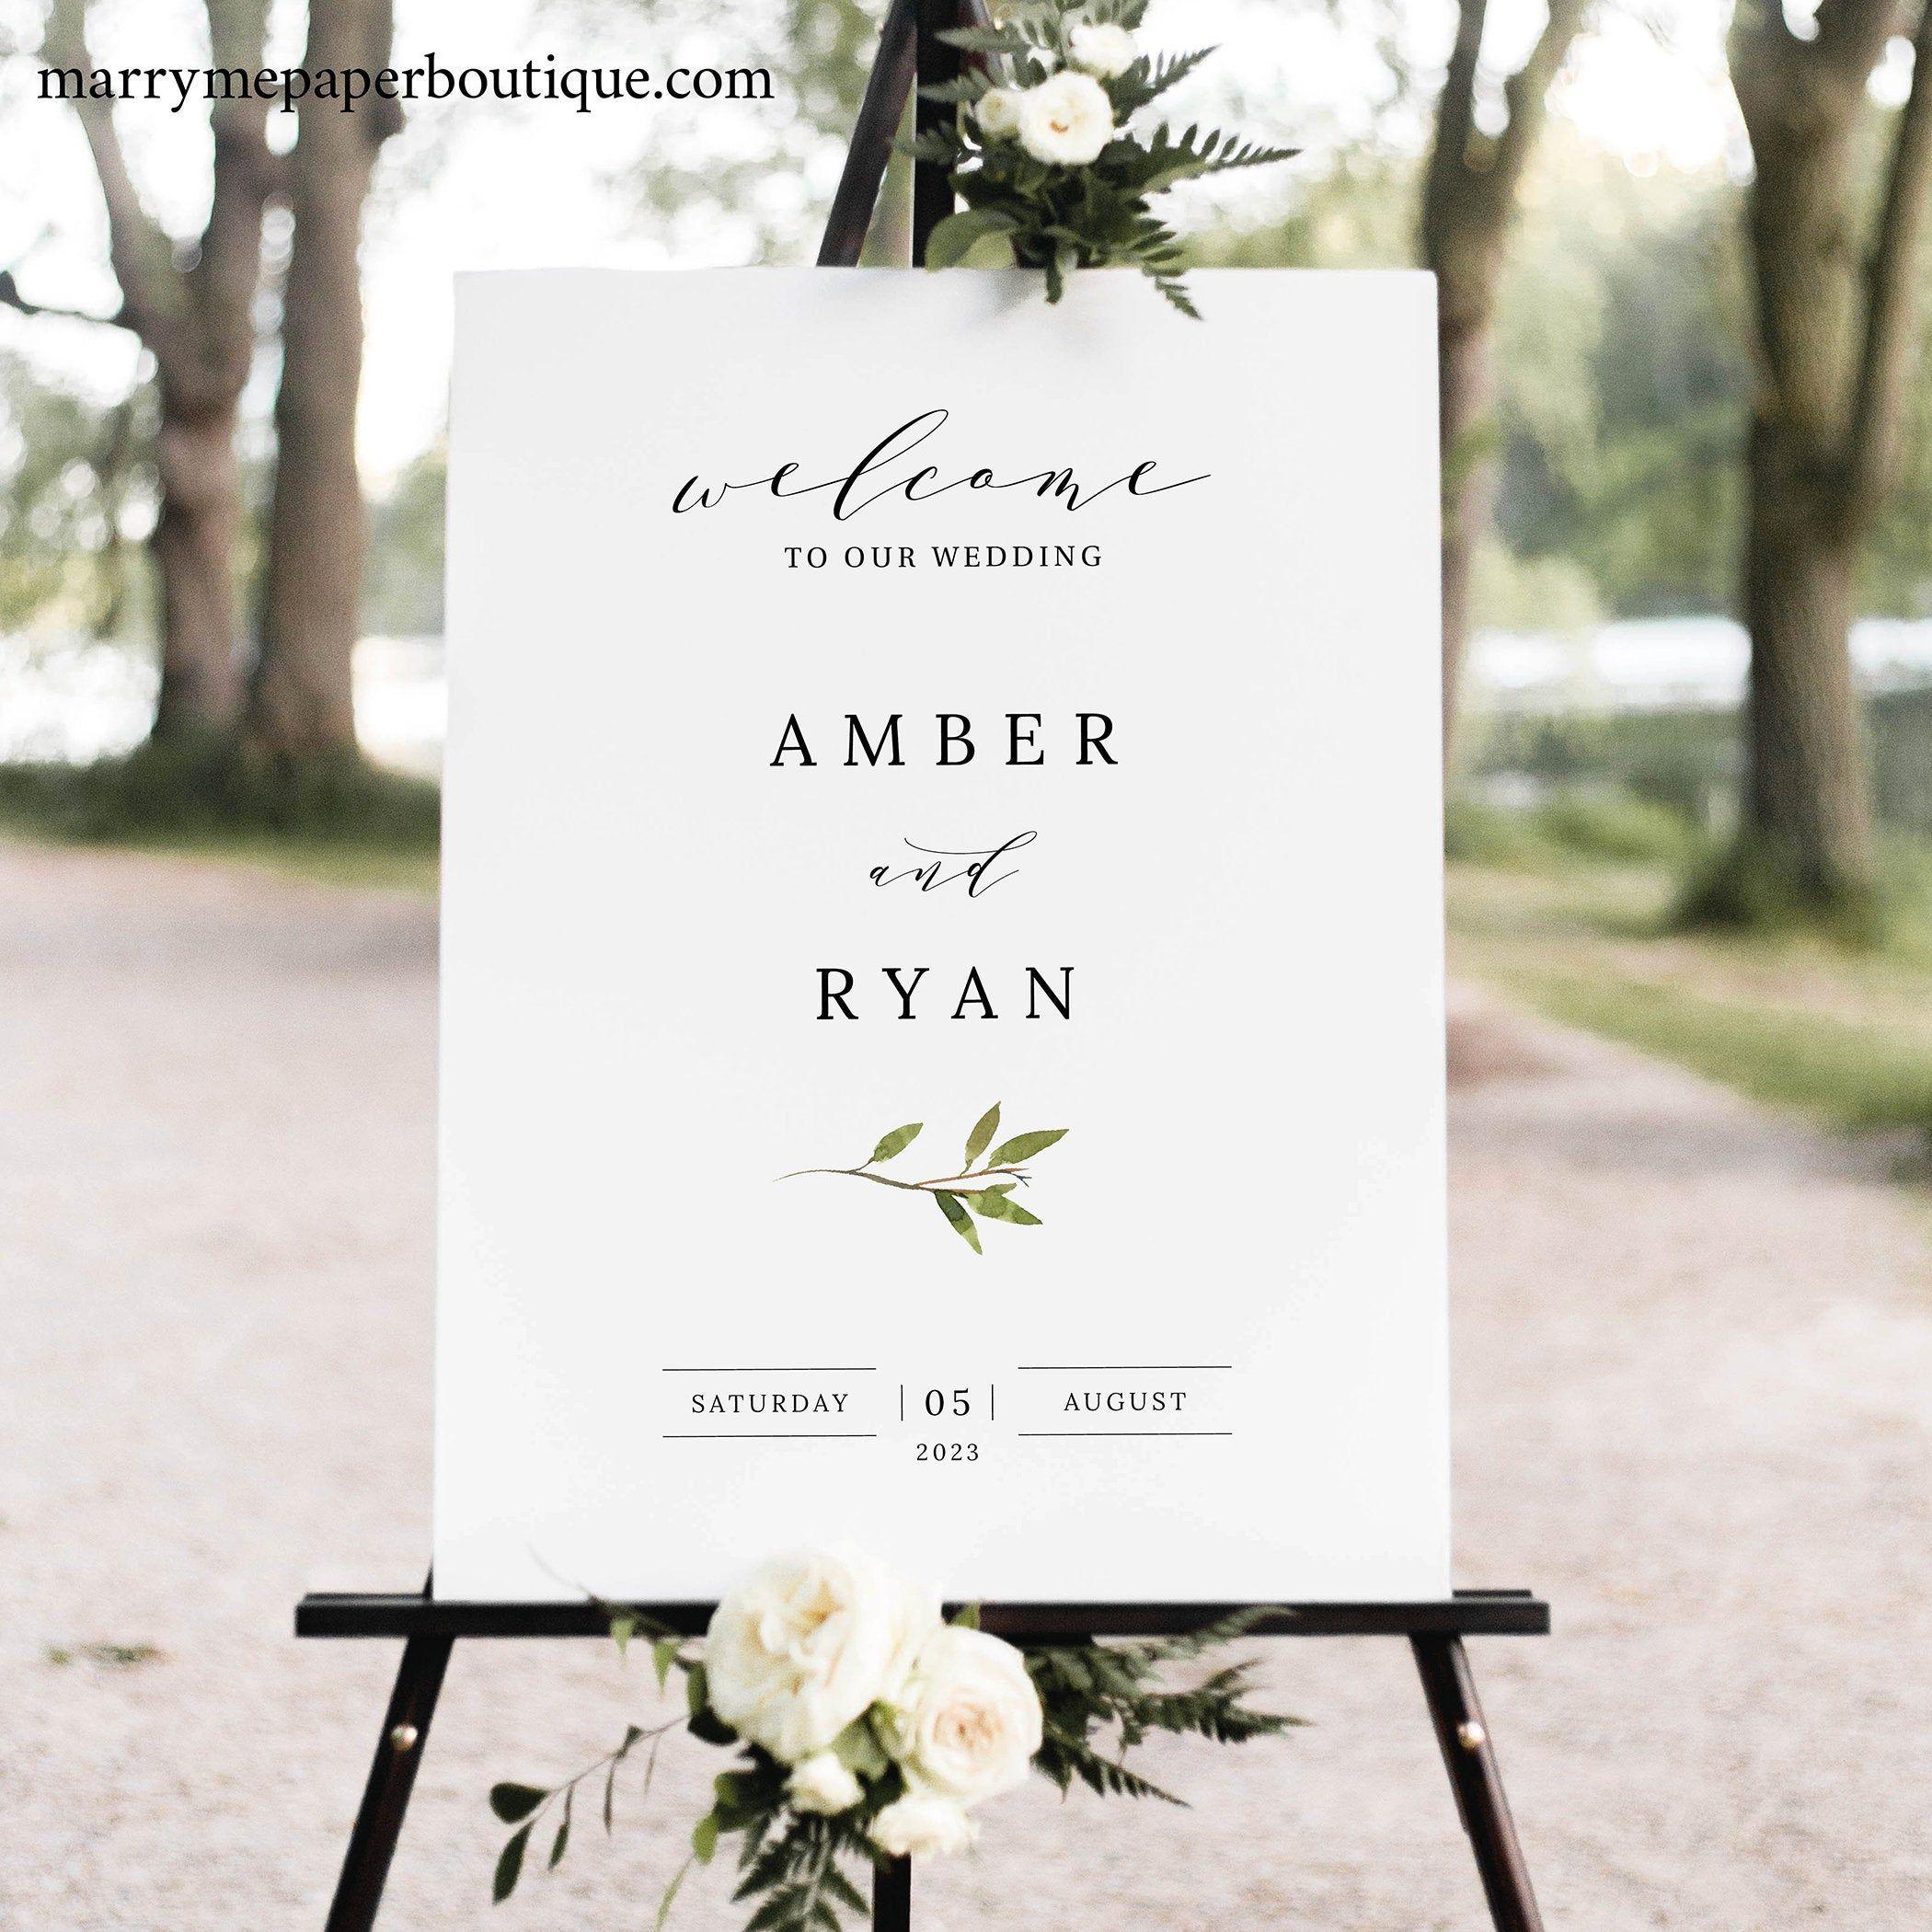 INSTANT DOWNLOAD Greenery Wedding Welcome Printable Wedding Welcome Sign 100/% Editable Welcome To Our Wedding